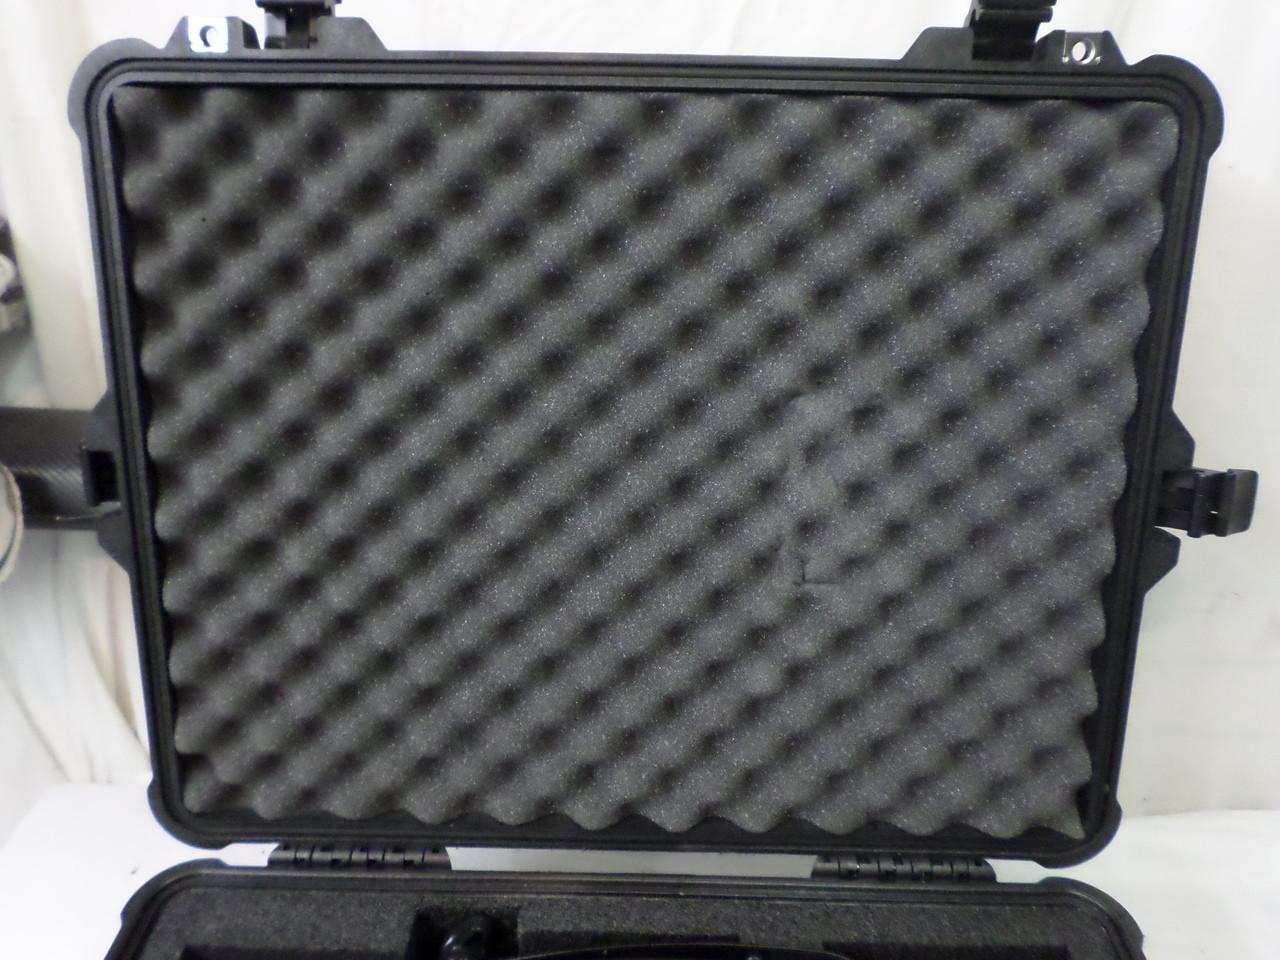 Astra 1x1 Bi-Color Shipping Case (Pelican Solution)